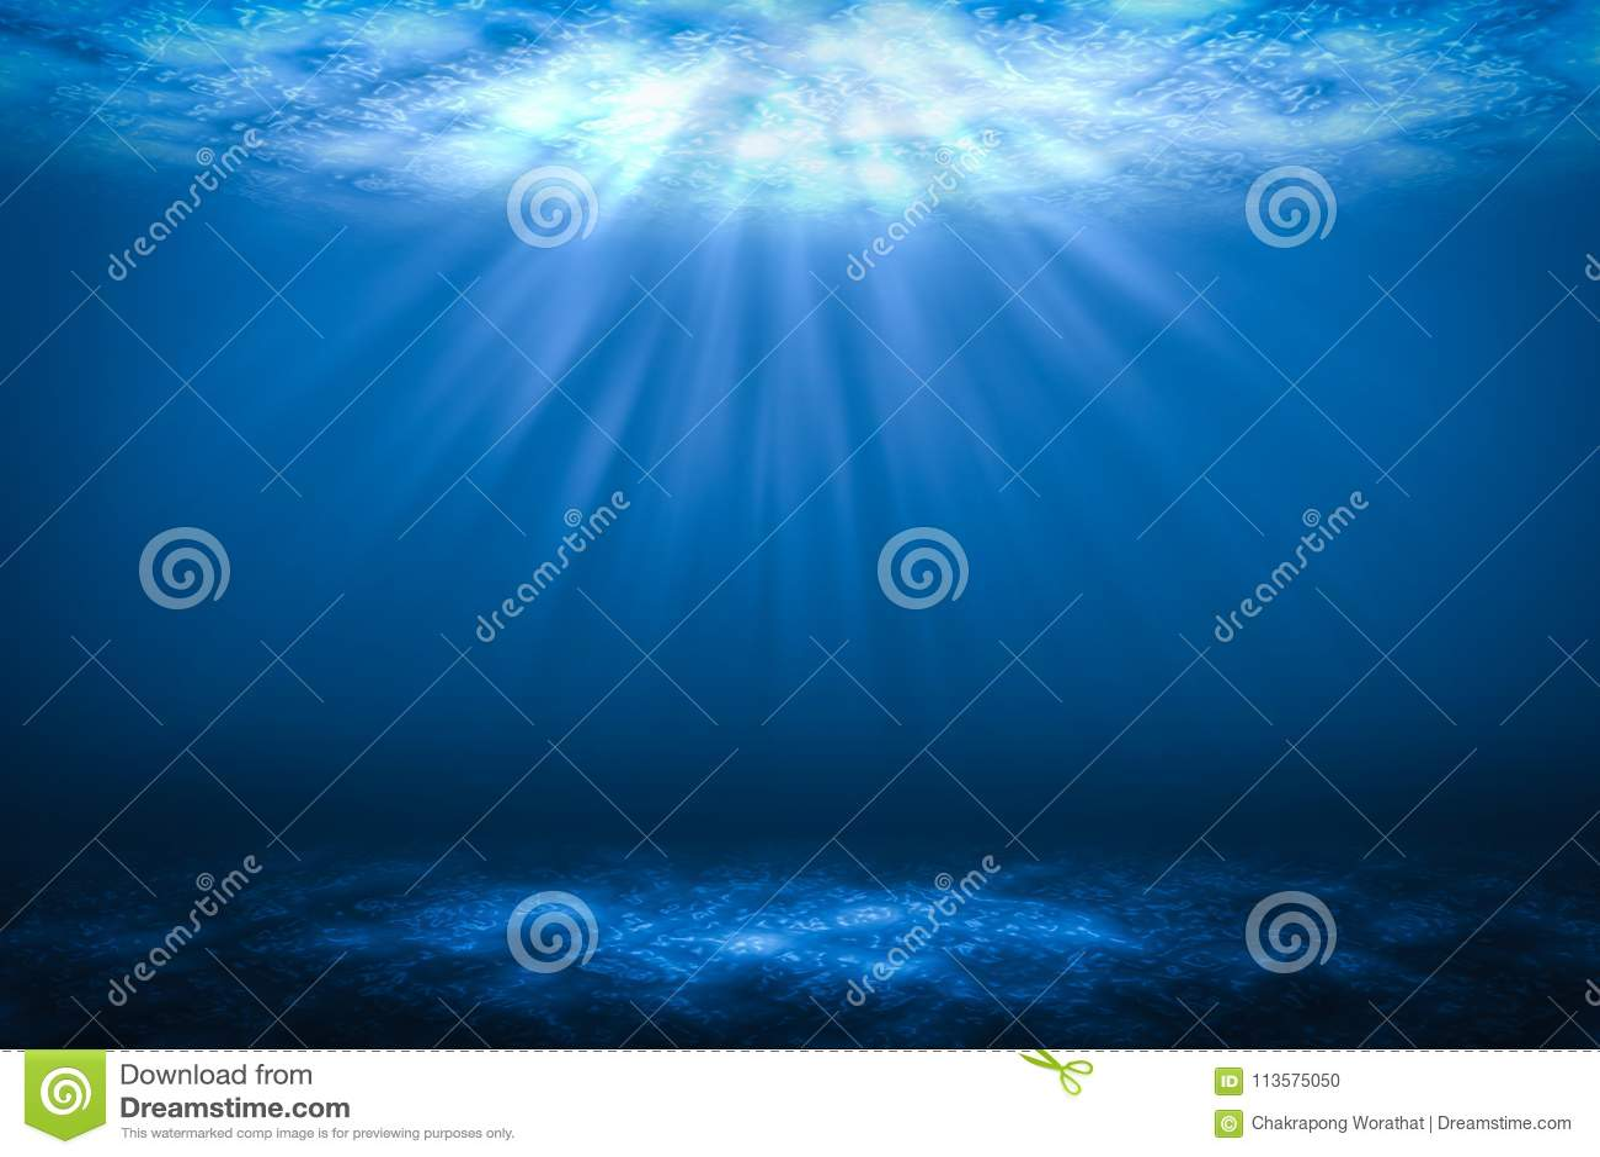 Fundos subaquáticos abstratos do raio de sol no mar